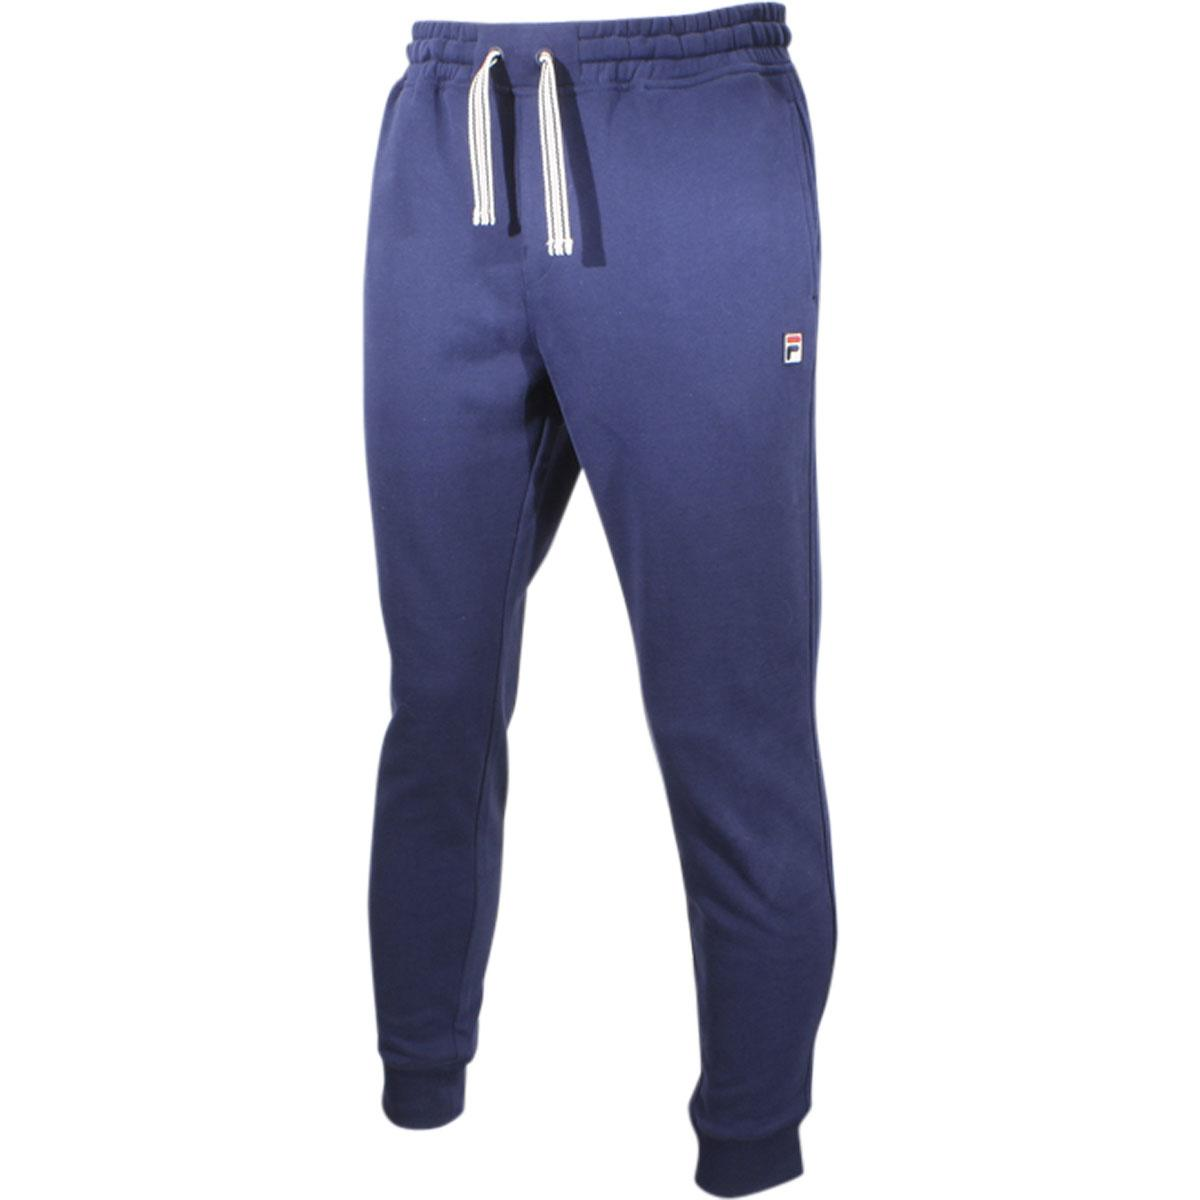 fe6b4c8bd1e29 Fila Men's Visconti Drawstring Jogger Pants